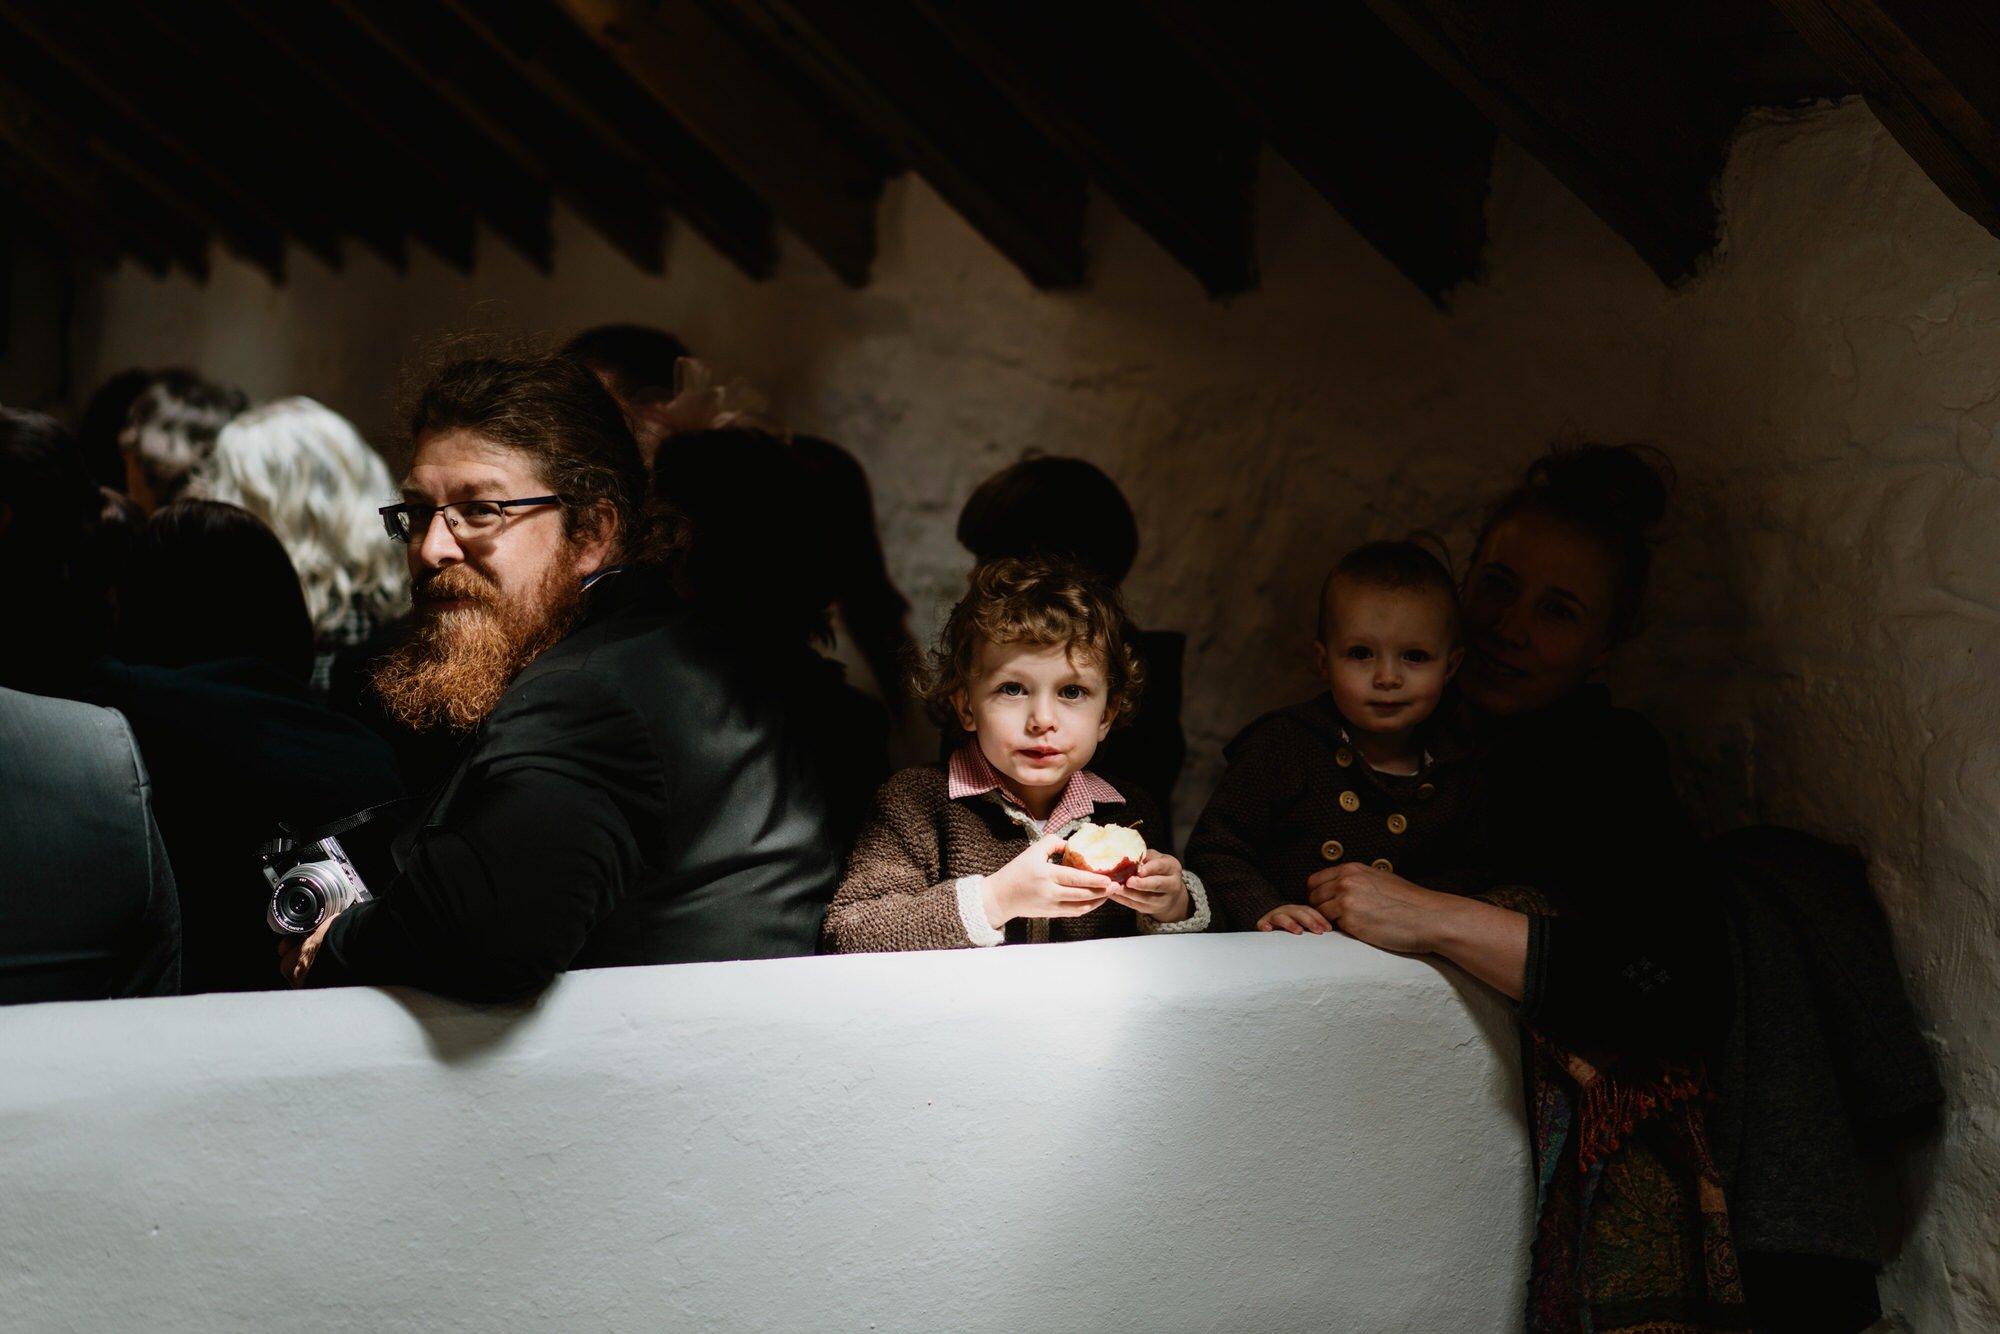 017 TIN SHED KNOCKRAICH WEDDING AUSTRIAN SCOTTISH ZOE ALEXANDRA PHOTOGRAPHY